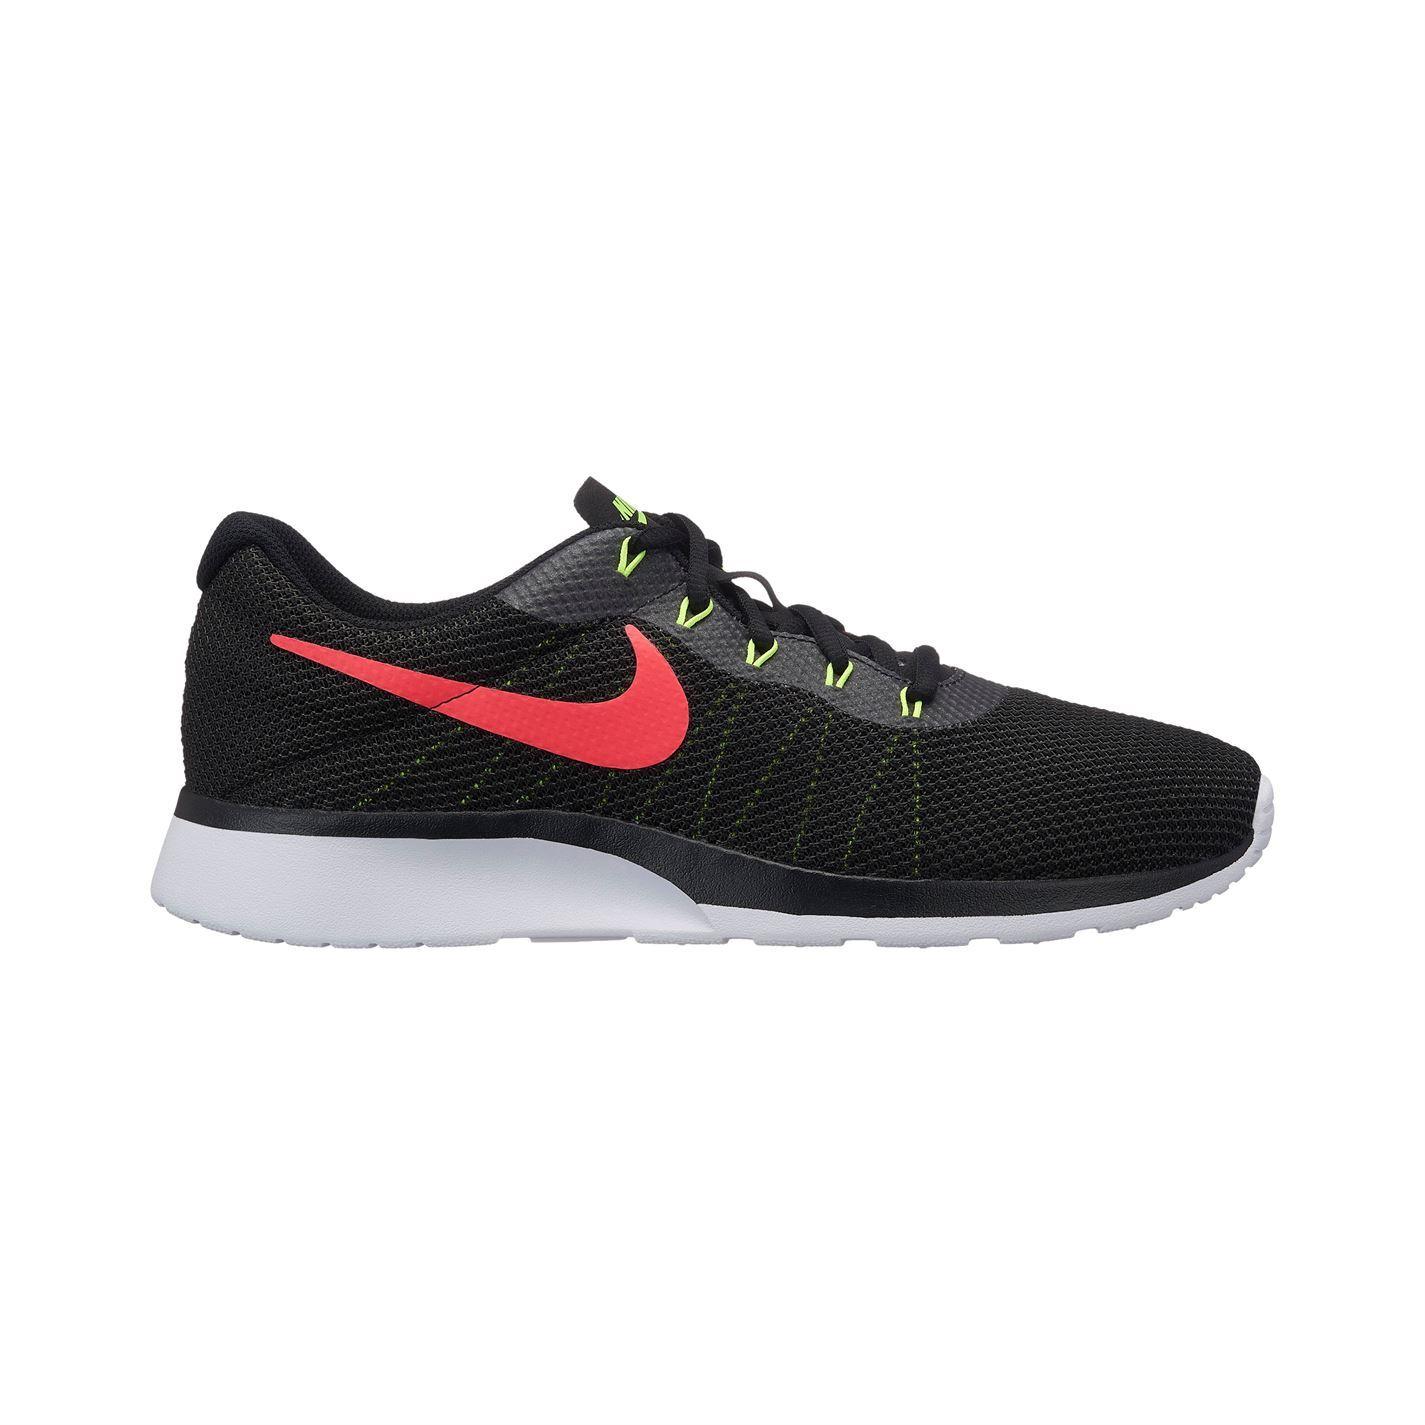 Tanjun Zapatillas Racer Trote Hombre Running Nike Fitness Zapatos 8qFEwnFd